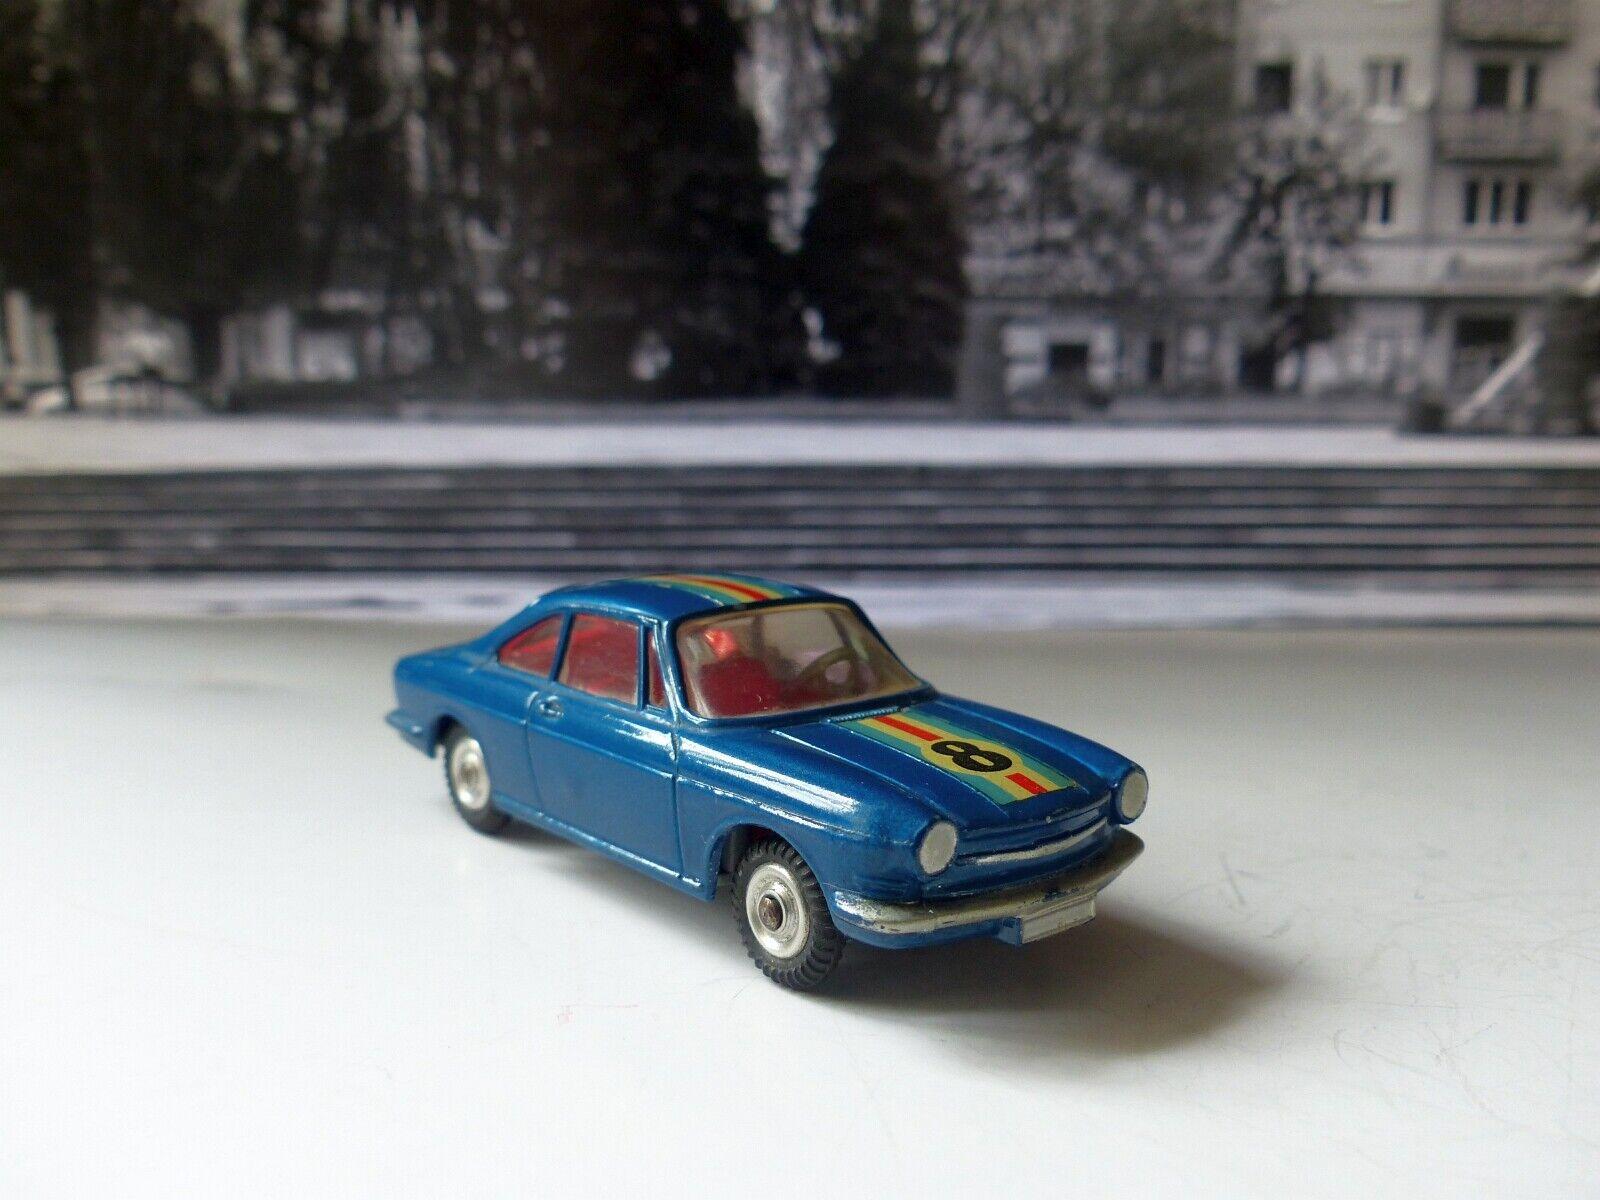 Corgi Toys 315 Simca 1000 in blueee